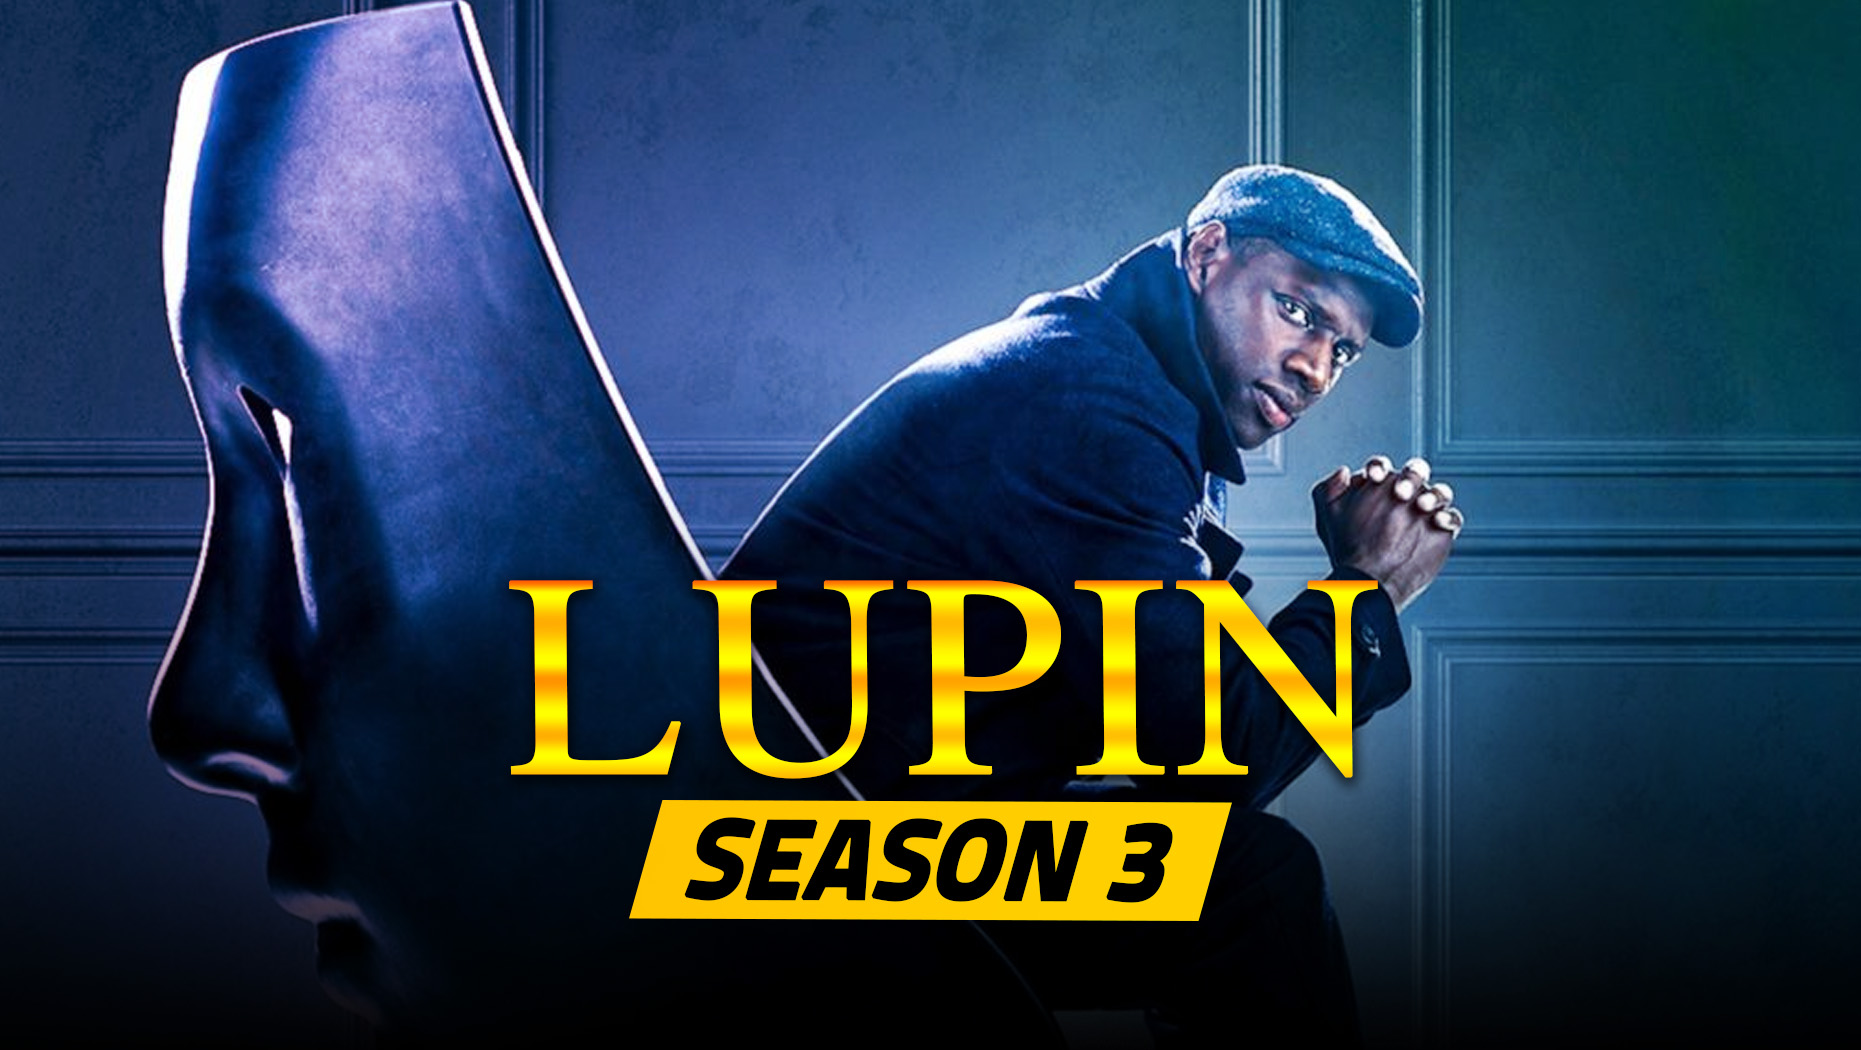 Lupin Season 3: Release Date For The New Season? - WTTSPOD